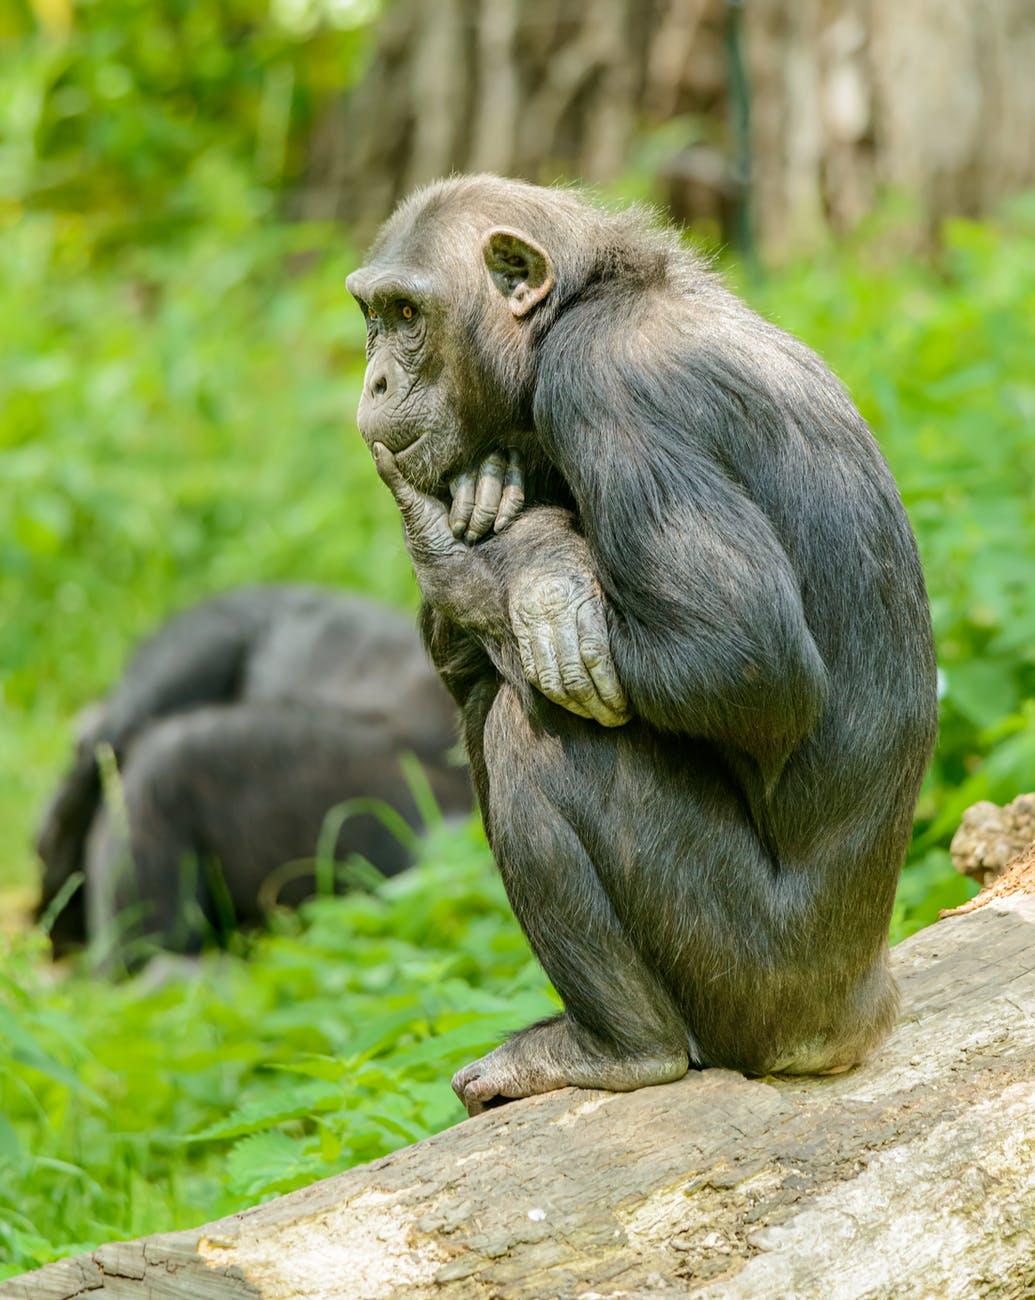 an ape sitting on concrete